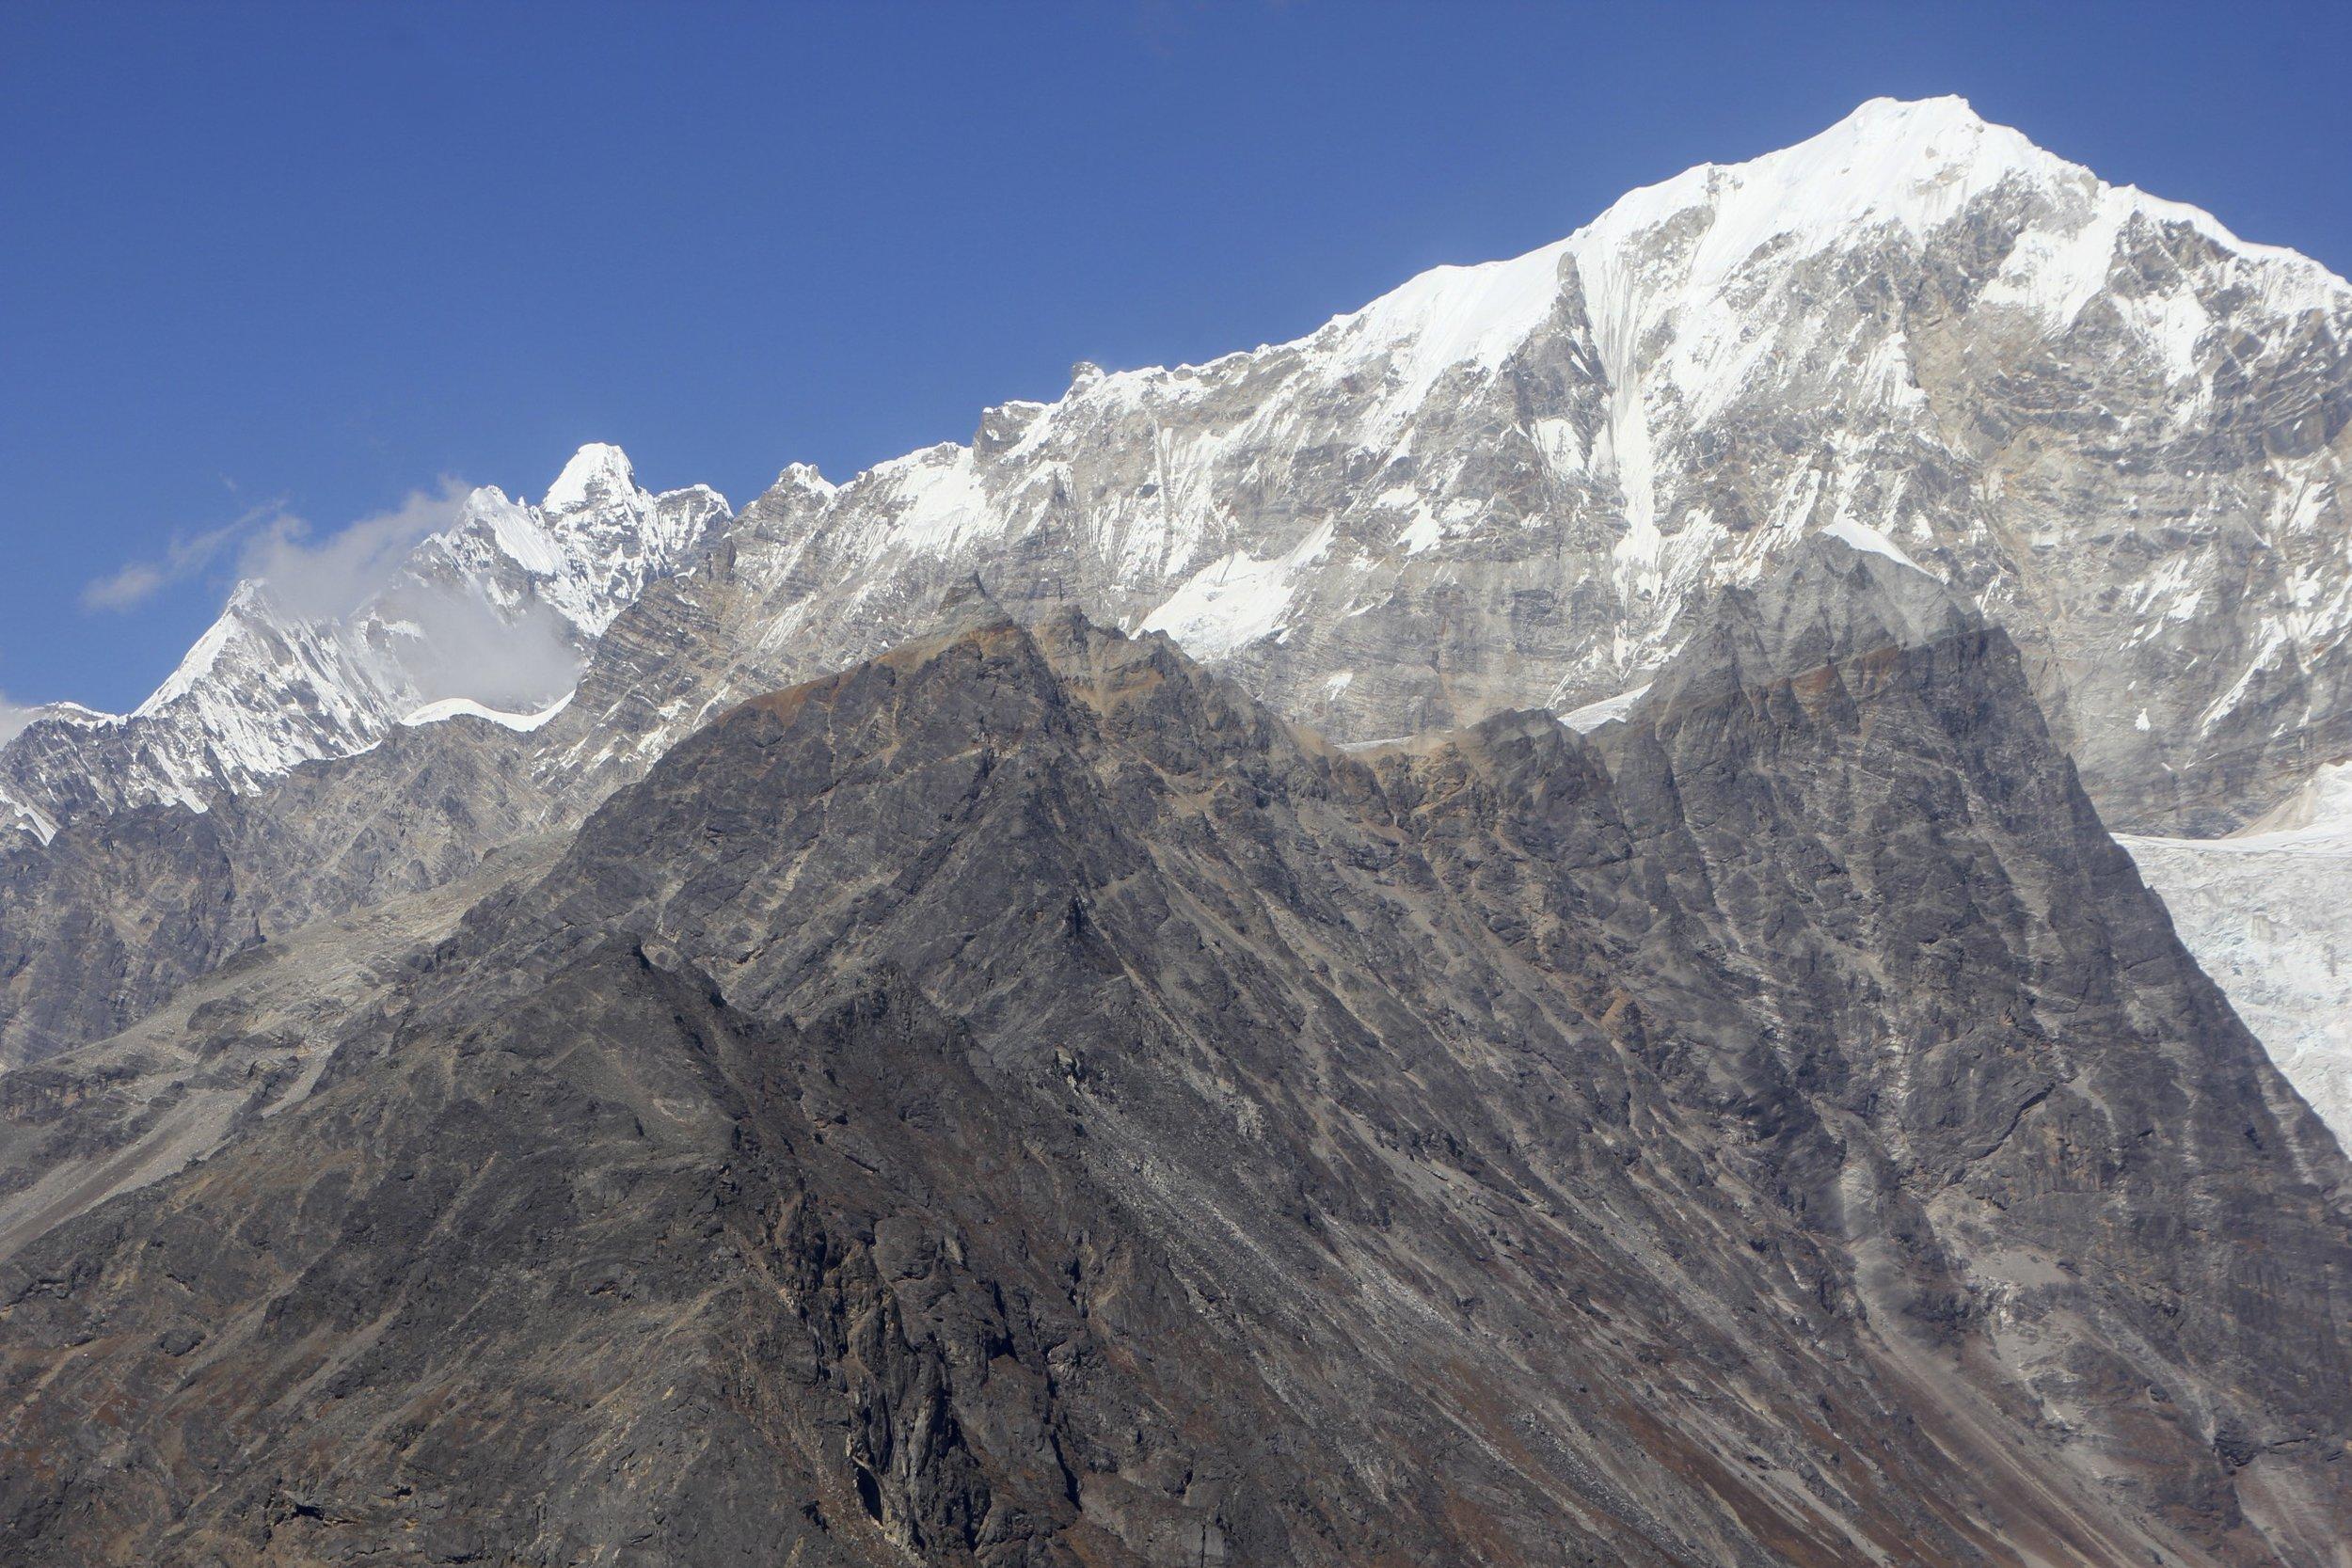 Yala Peak is the highest point along the rocky ridge